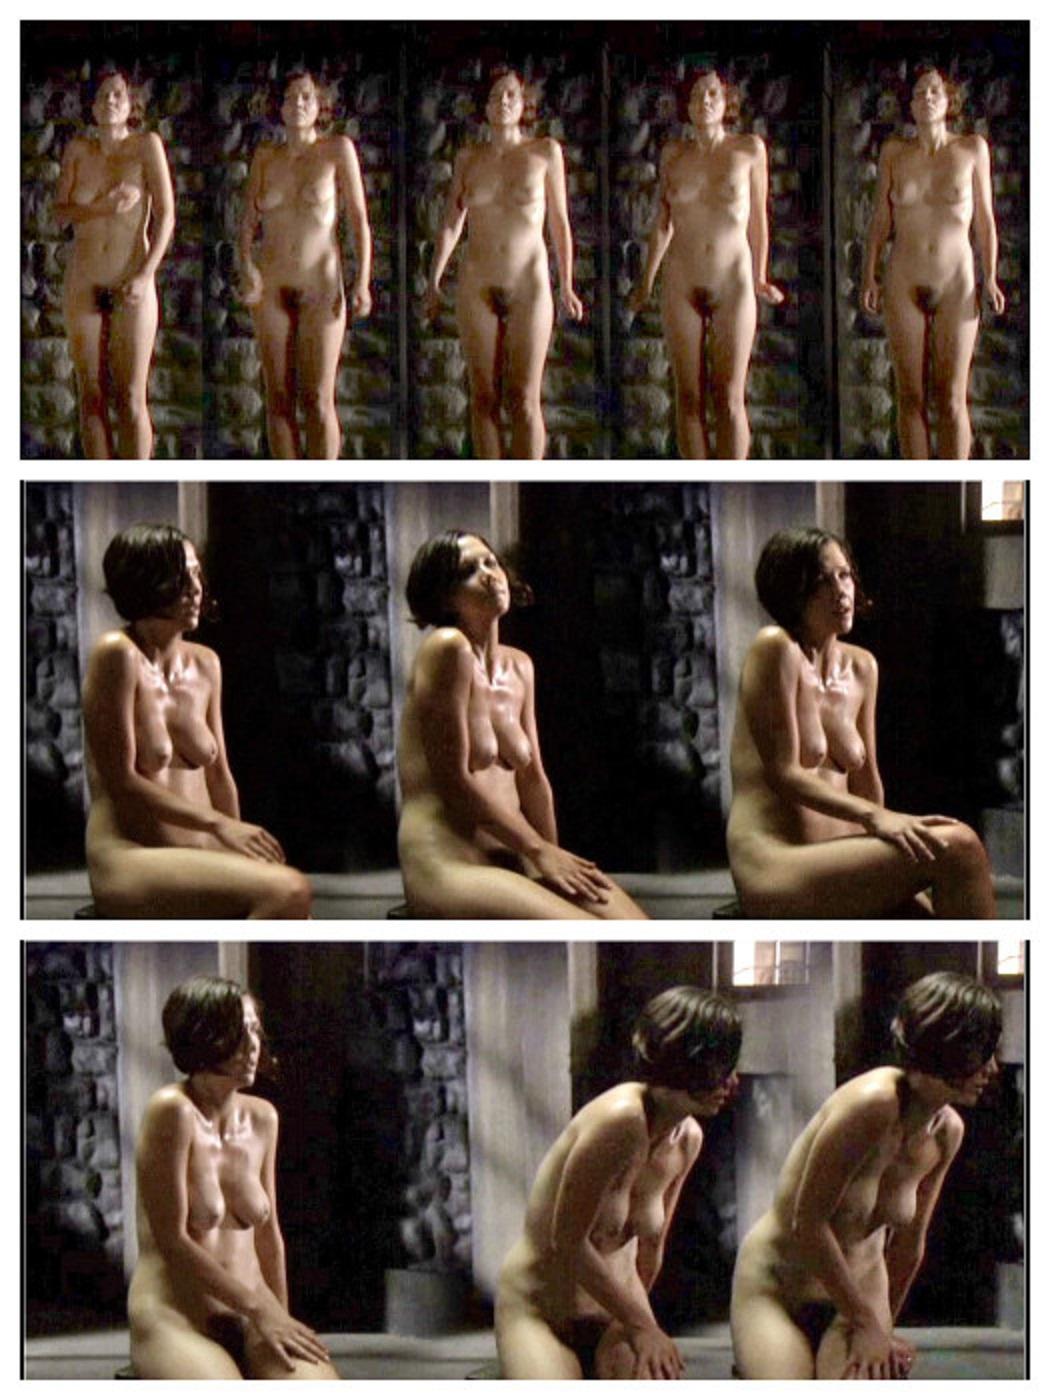 Natalia tena full frontal nudity free pics